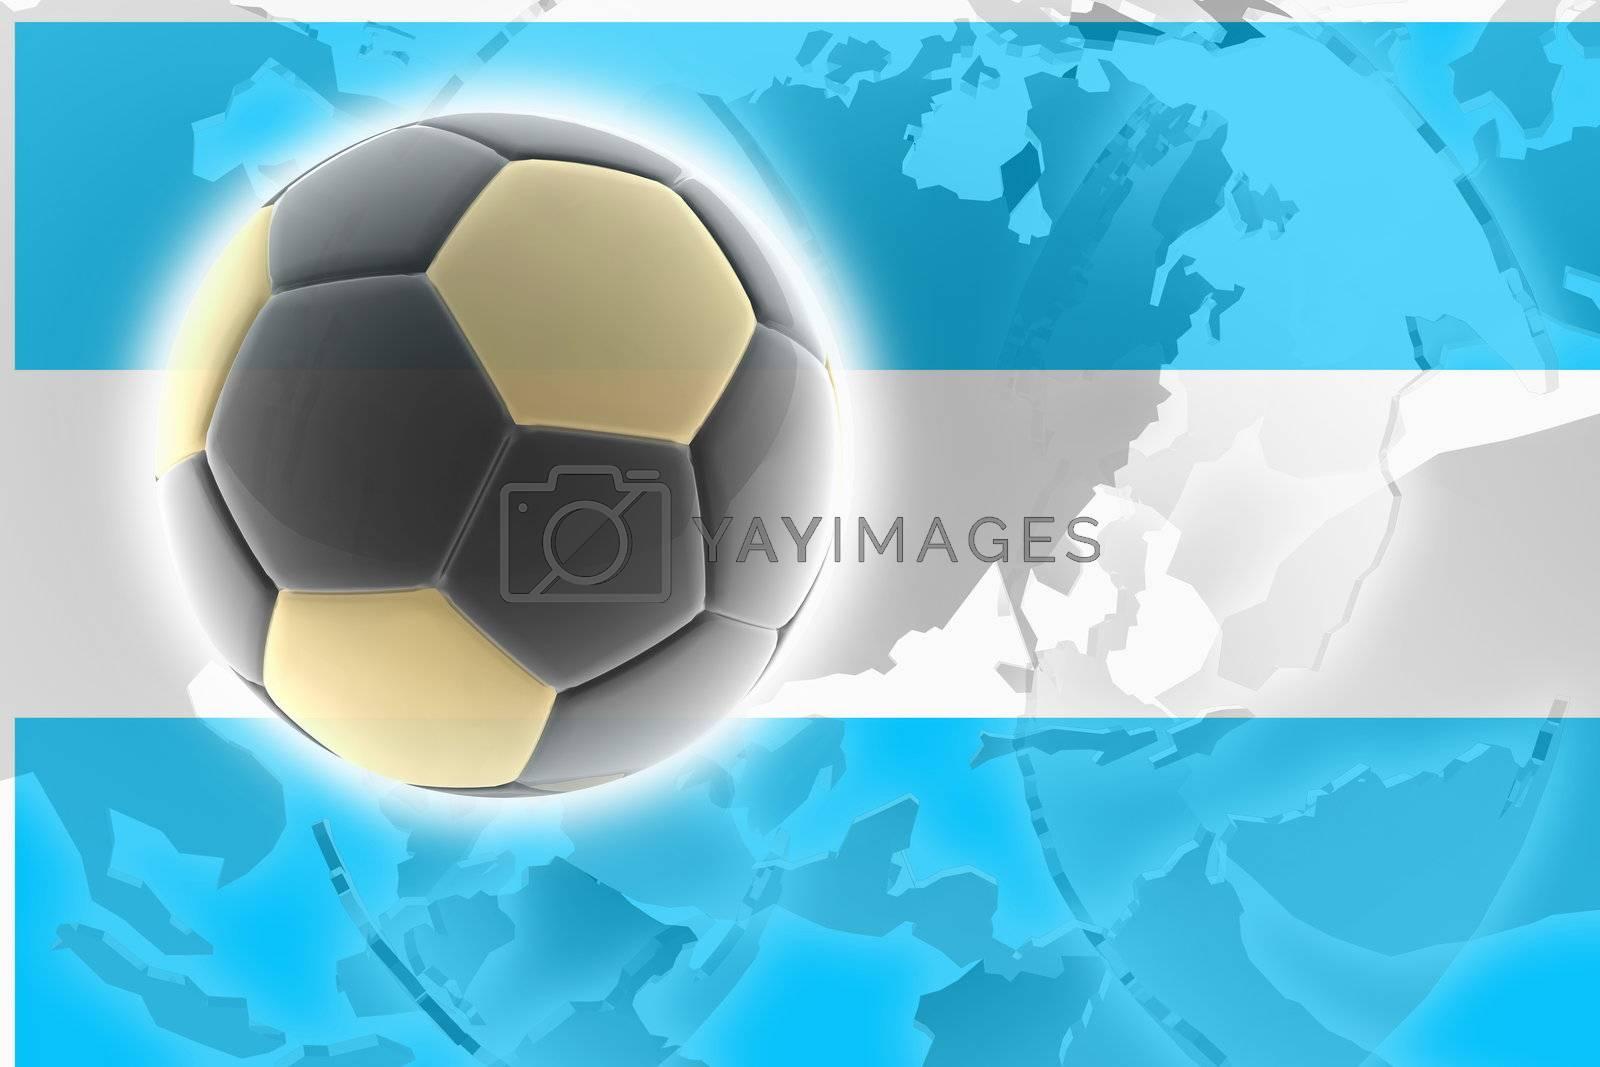 Flag of Argentina, national symbol illustration clipart sports soccer football